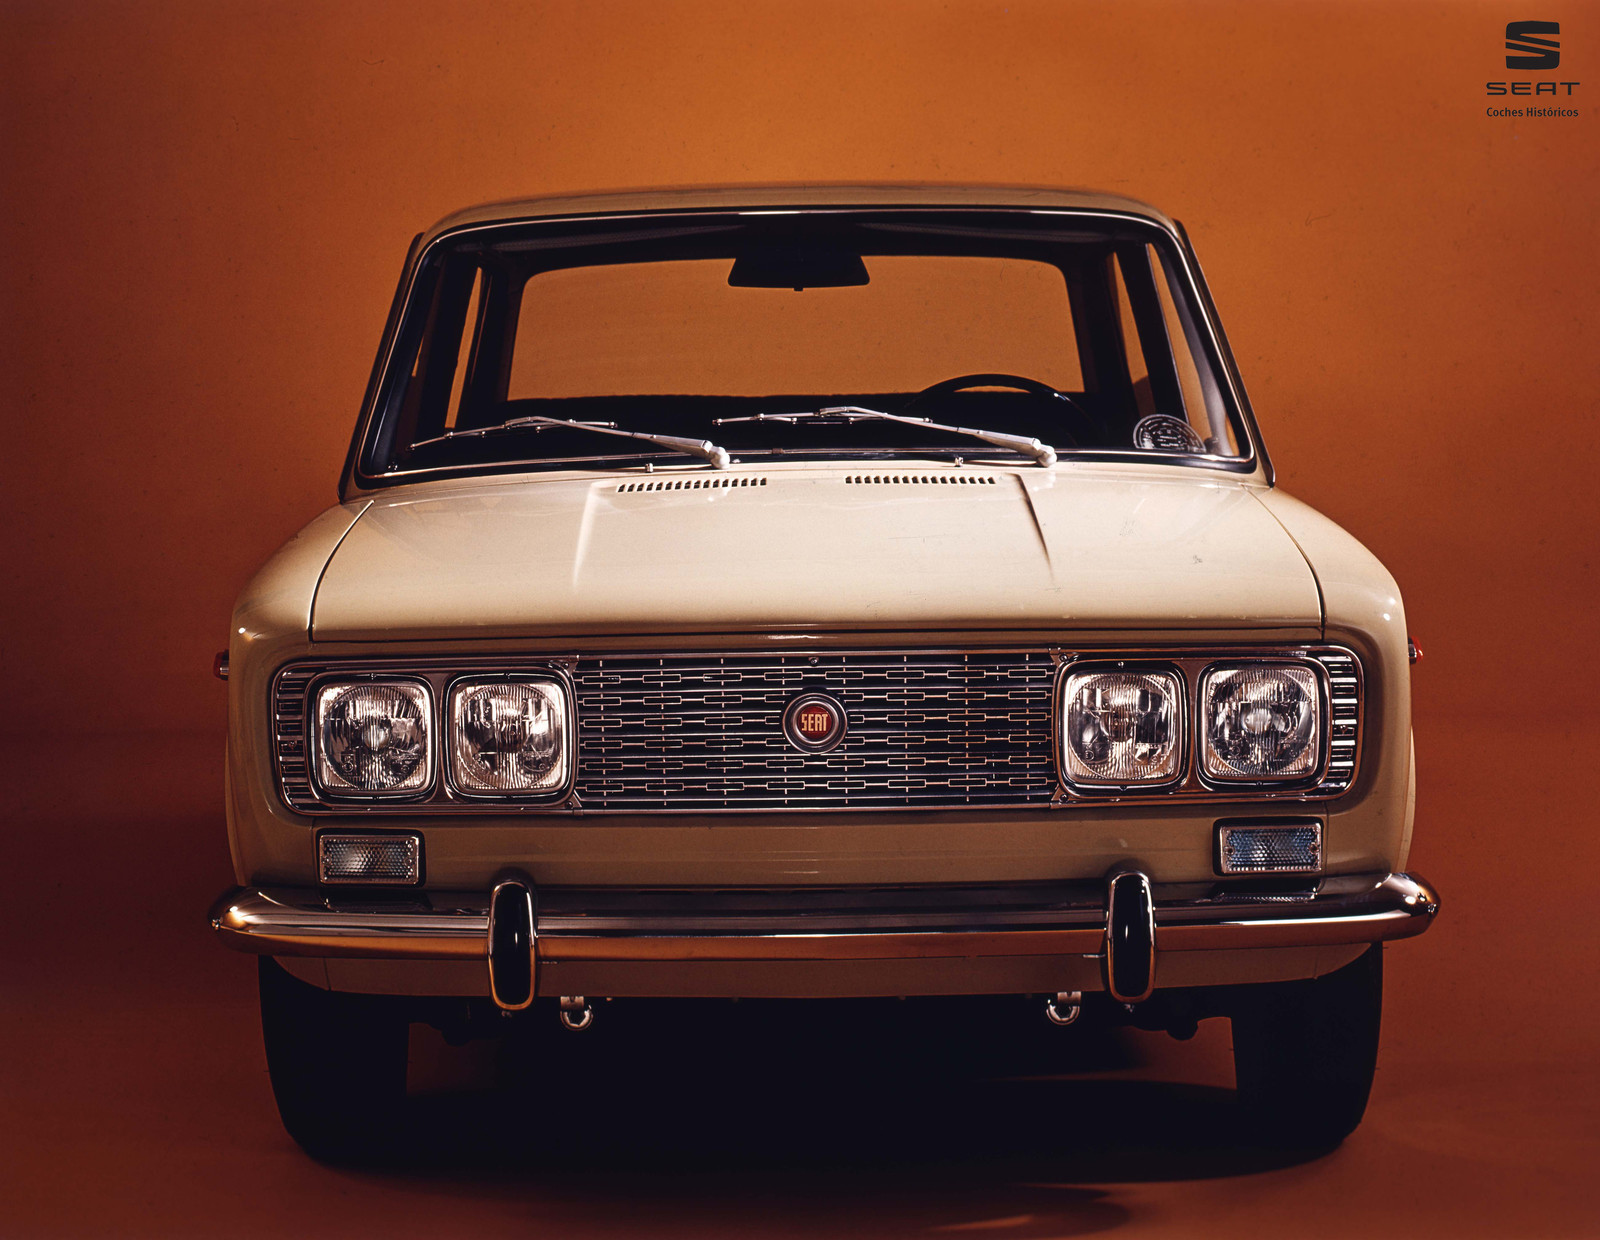 Foto de Motor SEAT 1430 - fotos históricas (3/49)